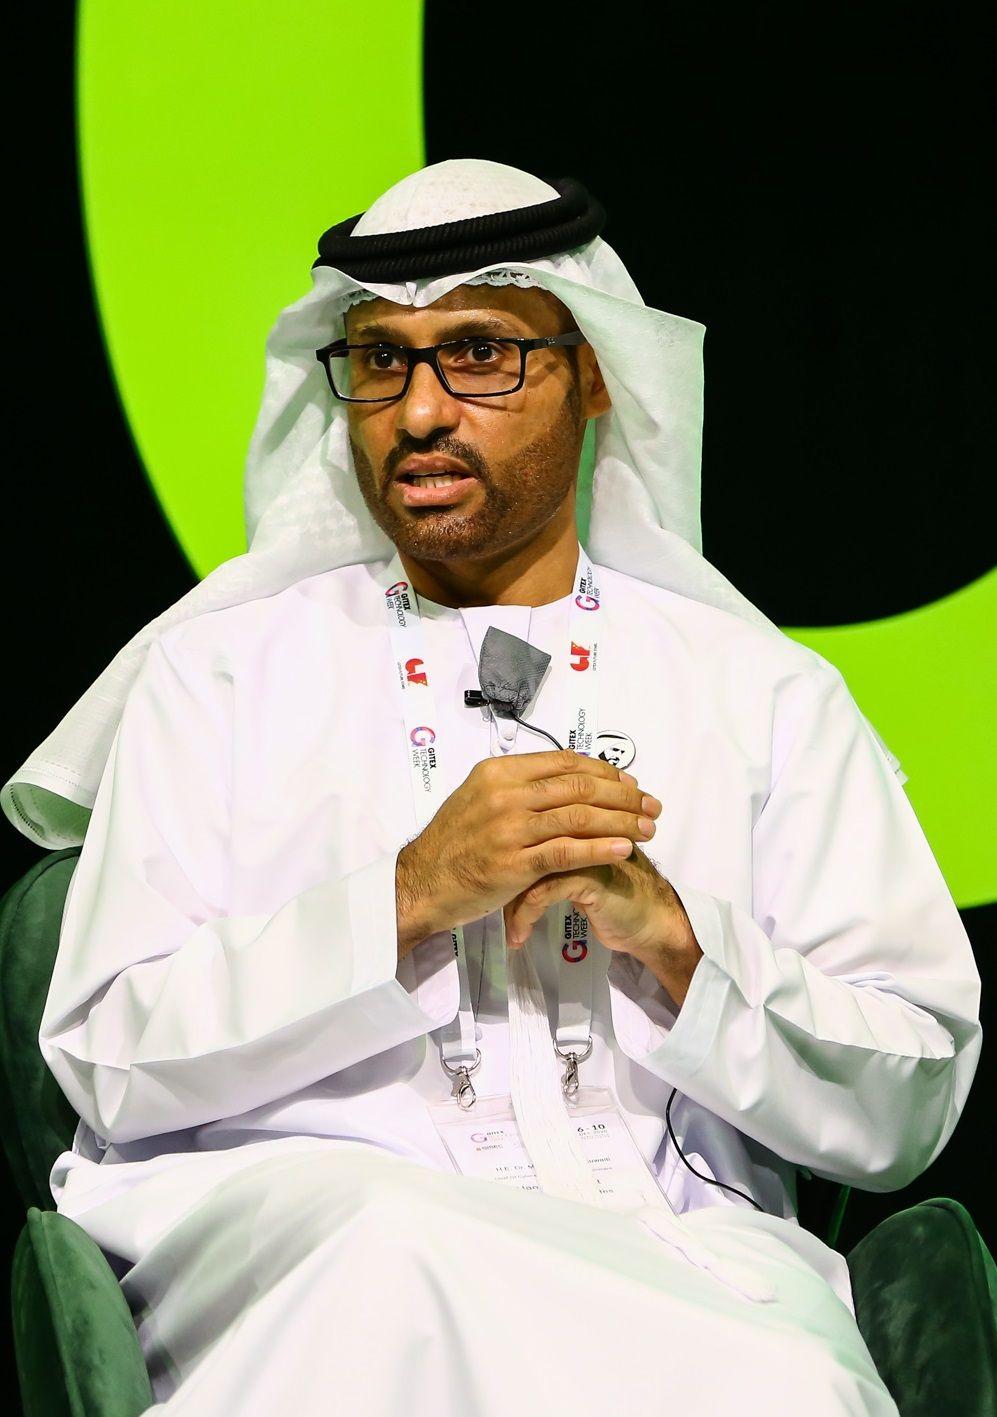 H.E. Dr. Mohamed Hamad Al-Kuwaiti